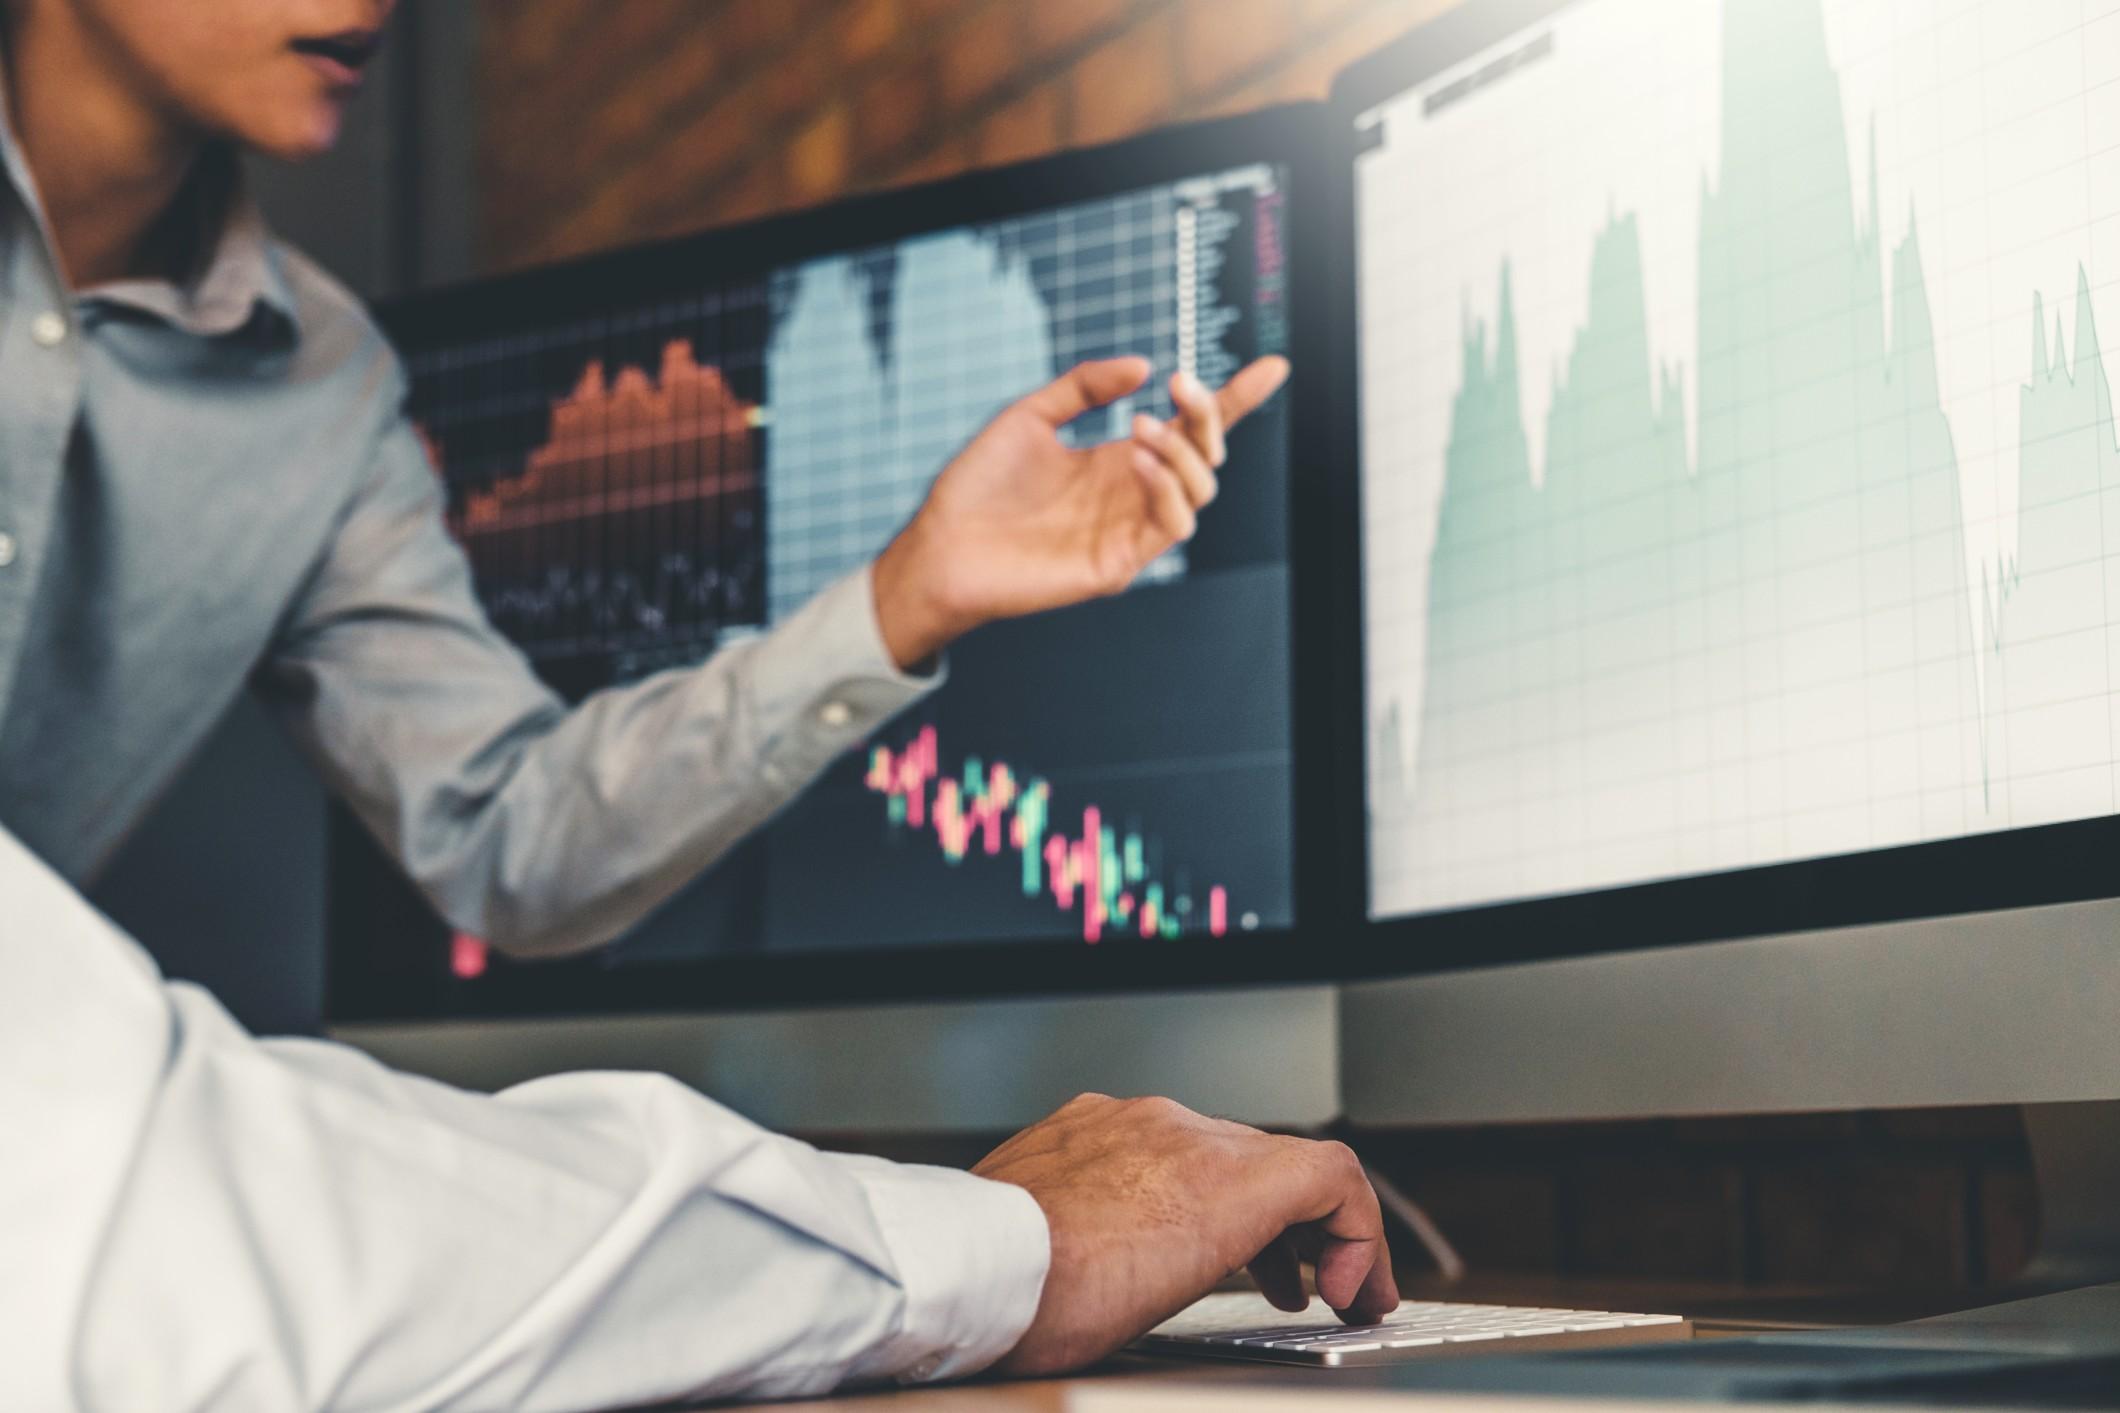 Tipp: Aktuelle Kurse verfolgen & in Aktien investieren! Bild:@penvipada151 via Twenty20